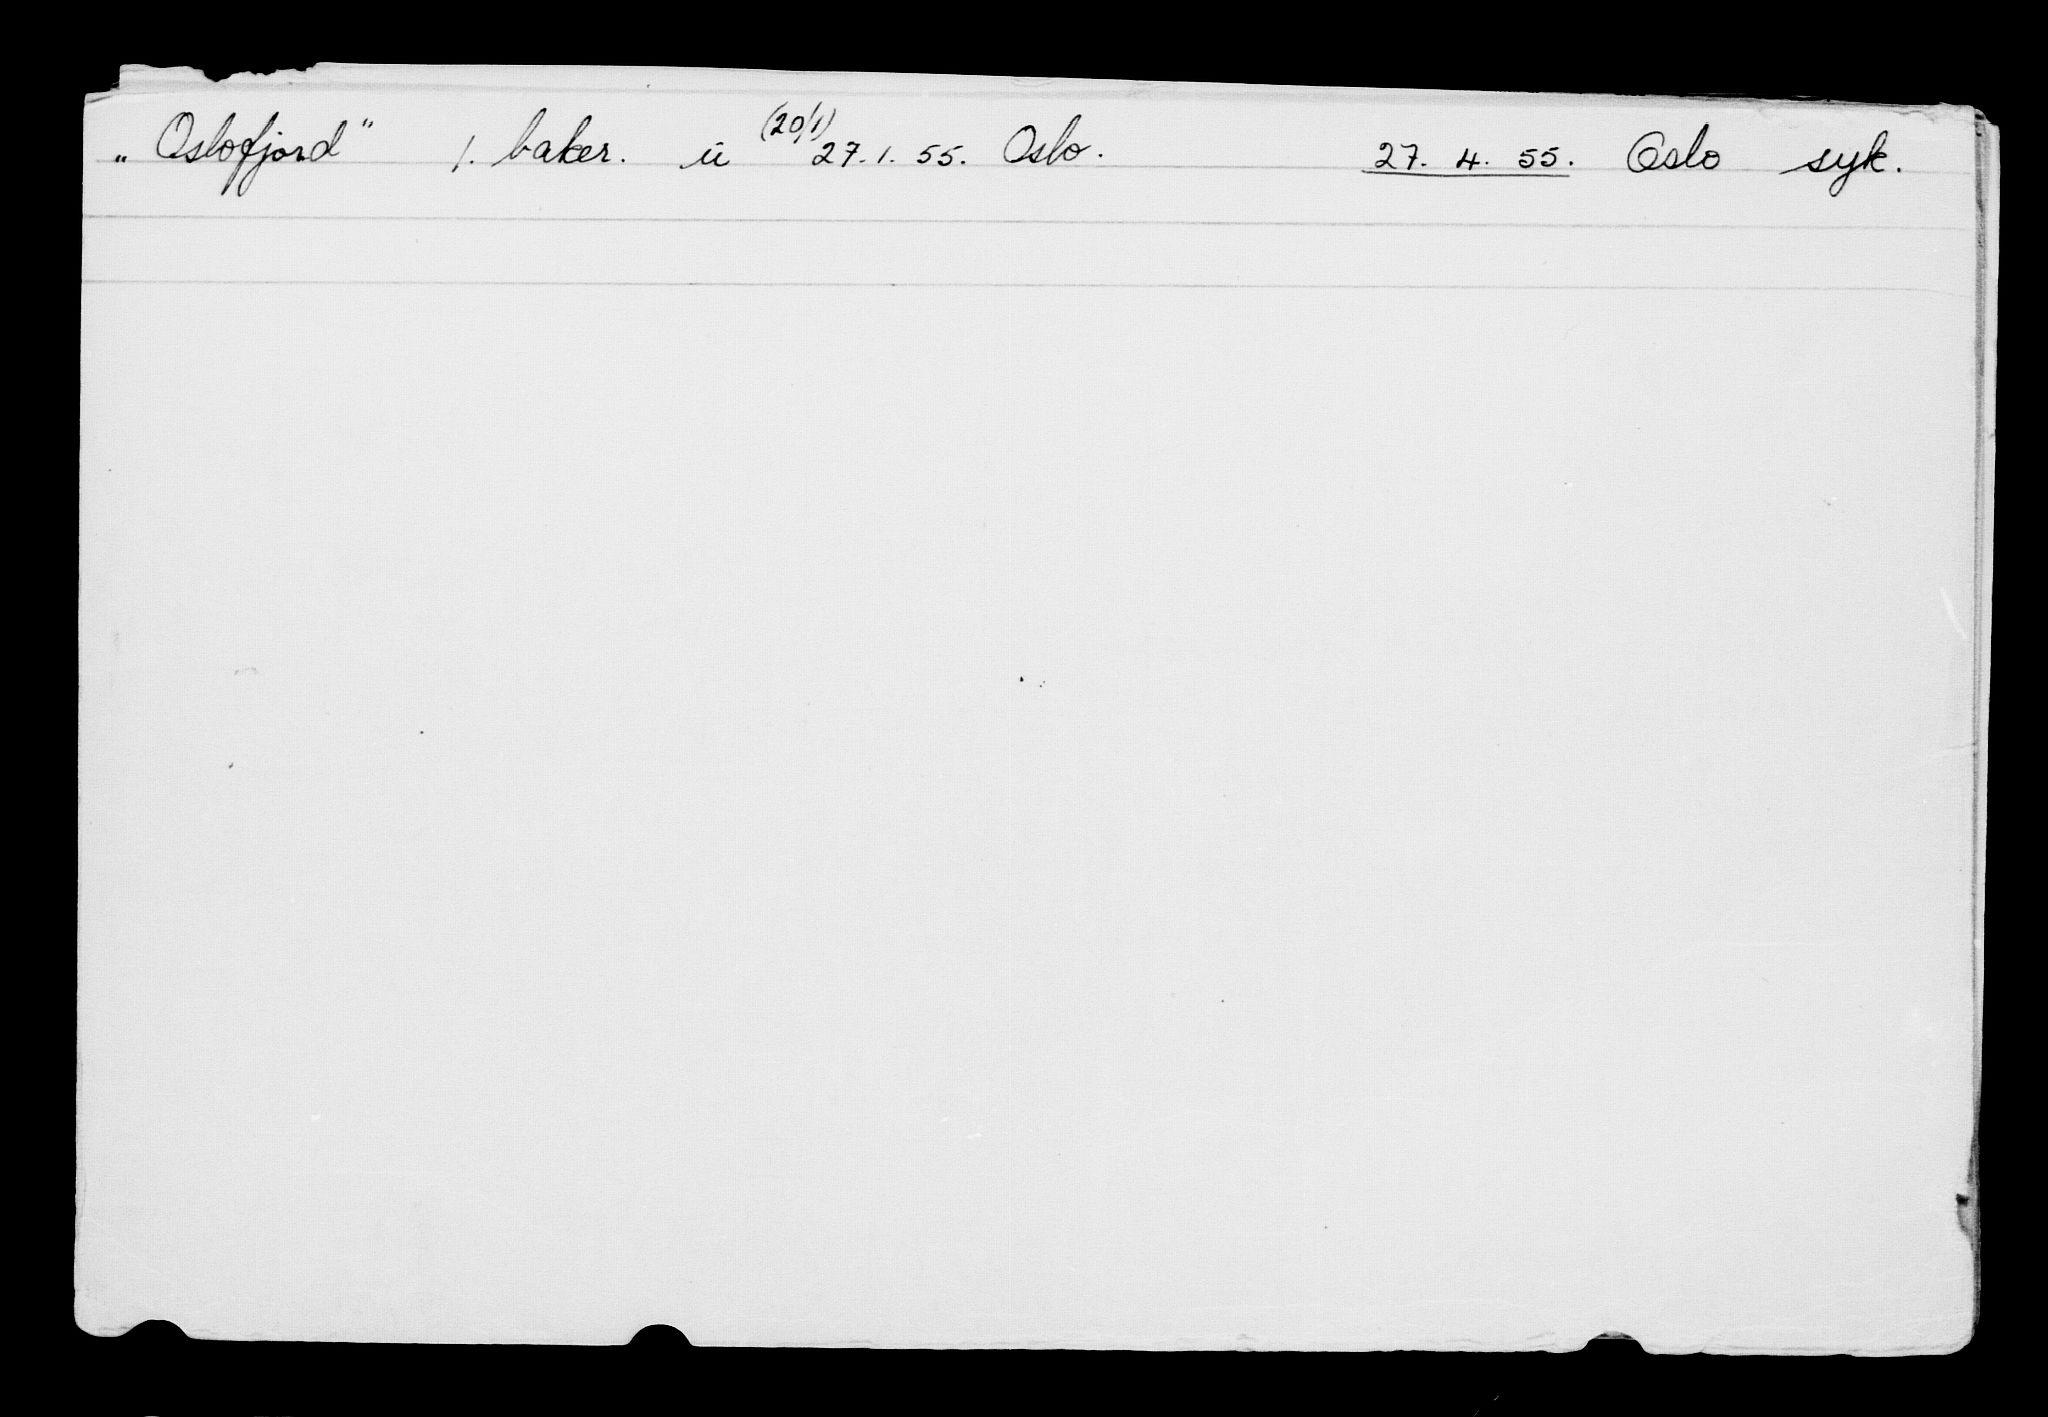 RA, Direktoratet for sjømenn, G/Gb/L0005: Hovedkort, 1888, s. 252